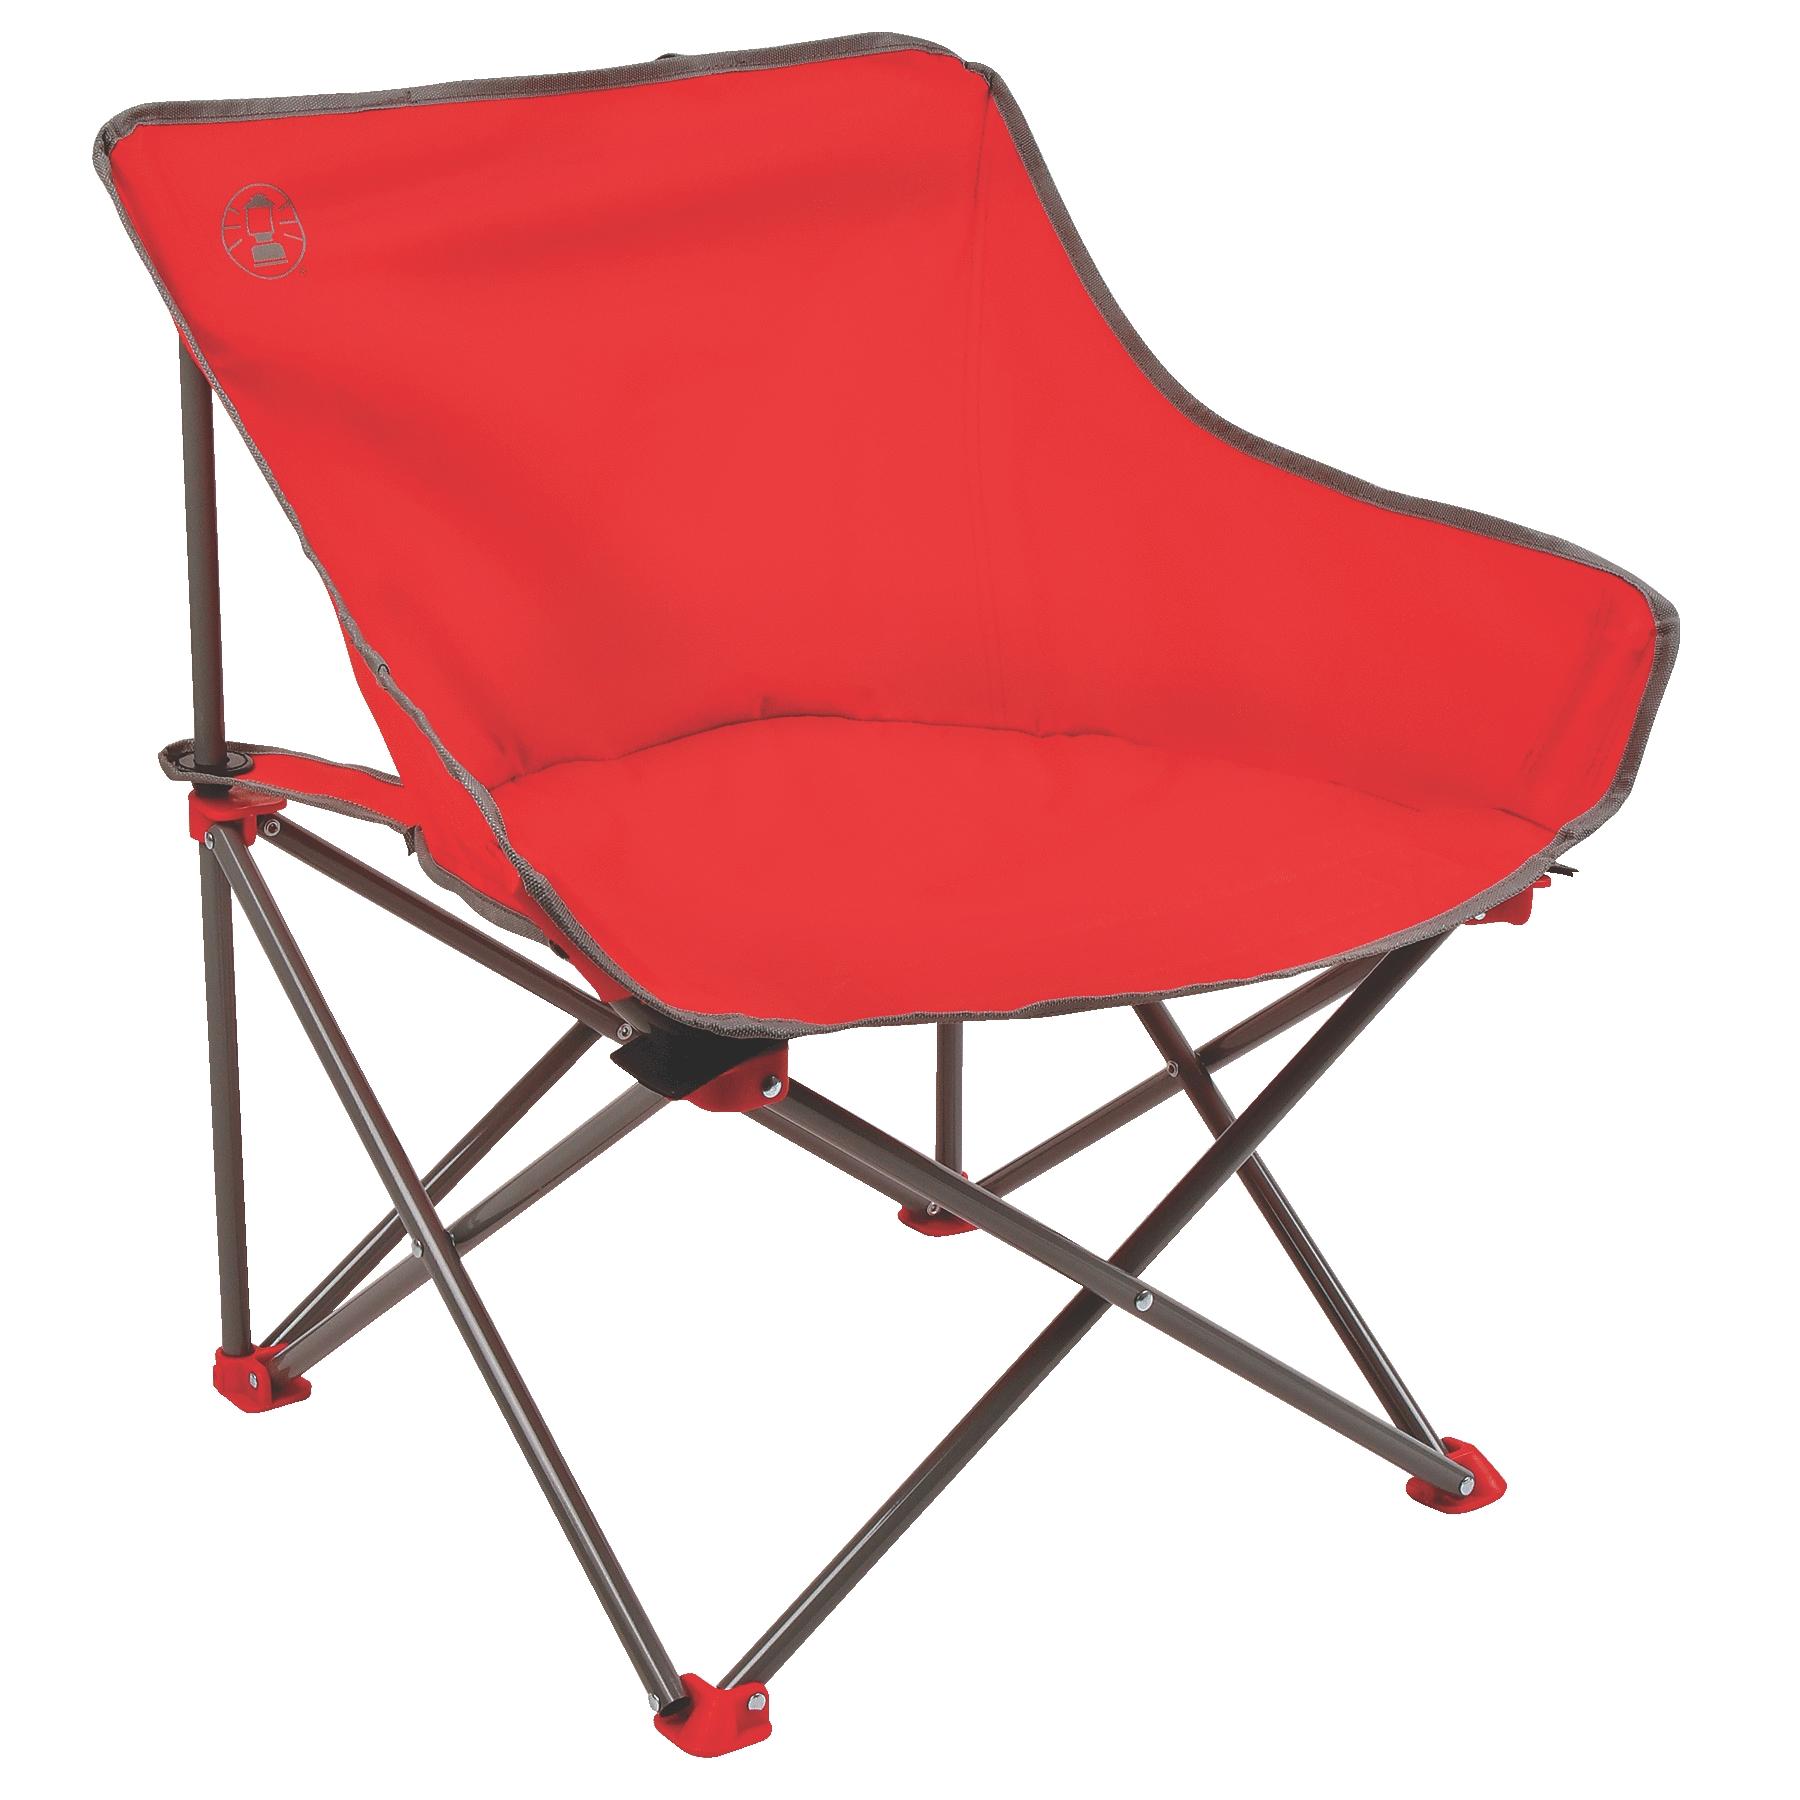 coleman lumbar quattro chair wedding covers for sale nz kick back taylor kaye